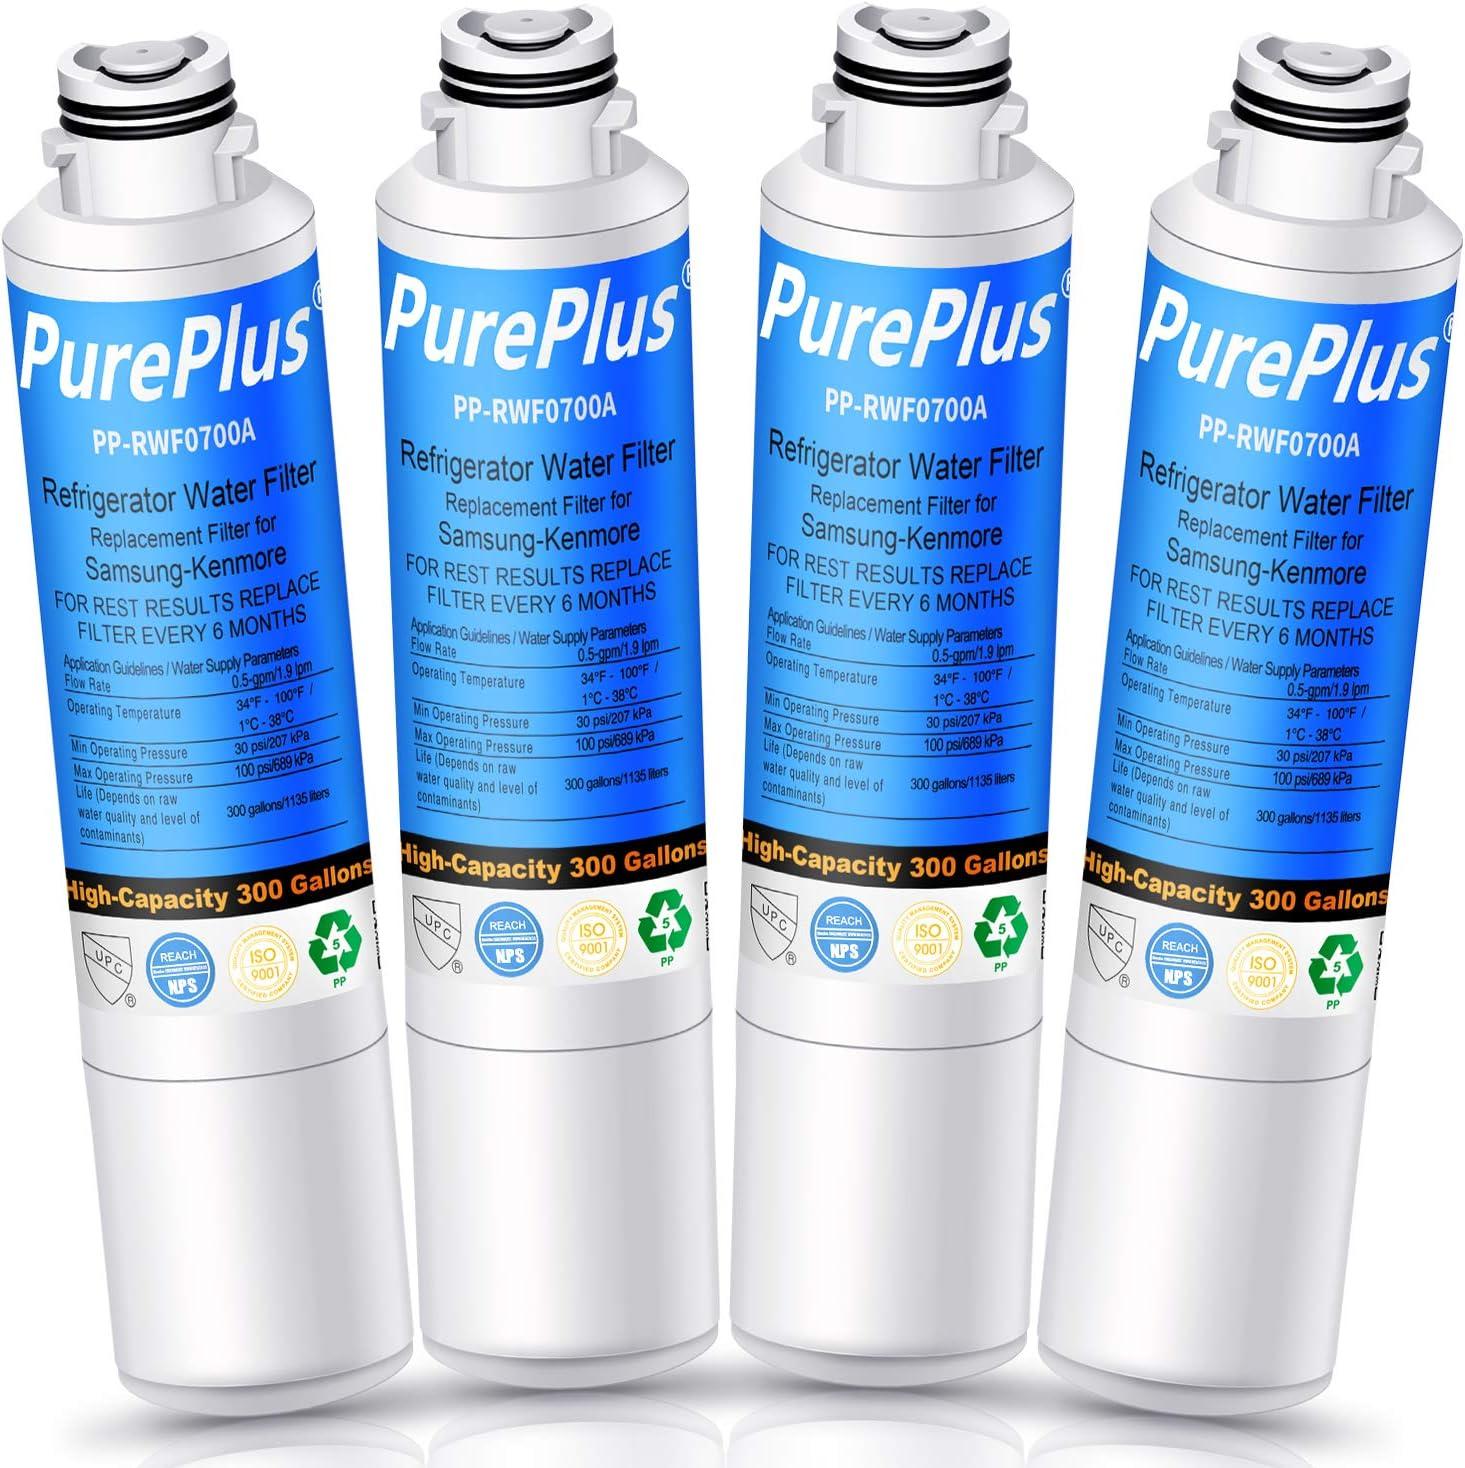 PUREPLUS DA29-00020B Refrigerator Water Filter, Replacement for Samsung DA29-00020A/B, HAF-CIN, HAF-CIN/EXP, DA97-08006A, 9101, HDX FMS-2, RF28HMEDBSR, RF4287HARS, RF263TEAESG, RH22H9010SR (Pack of 4)